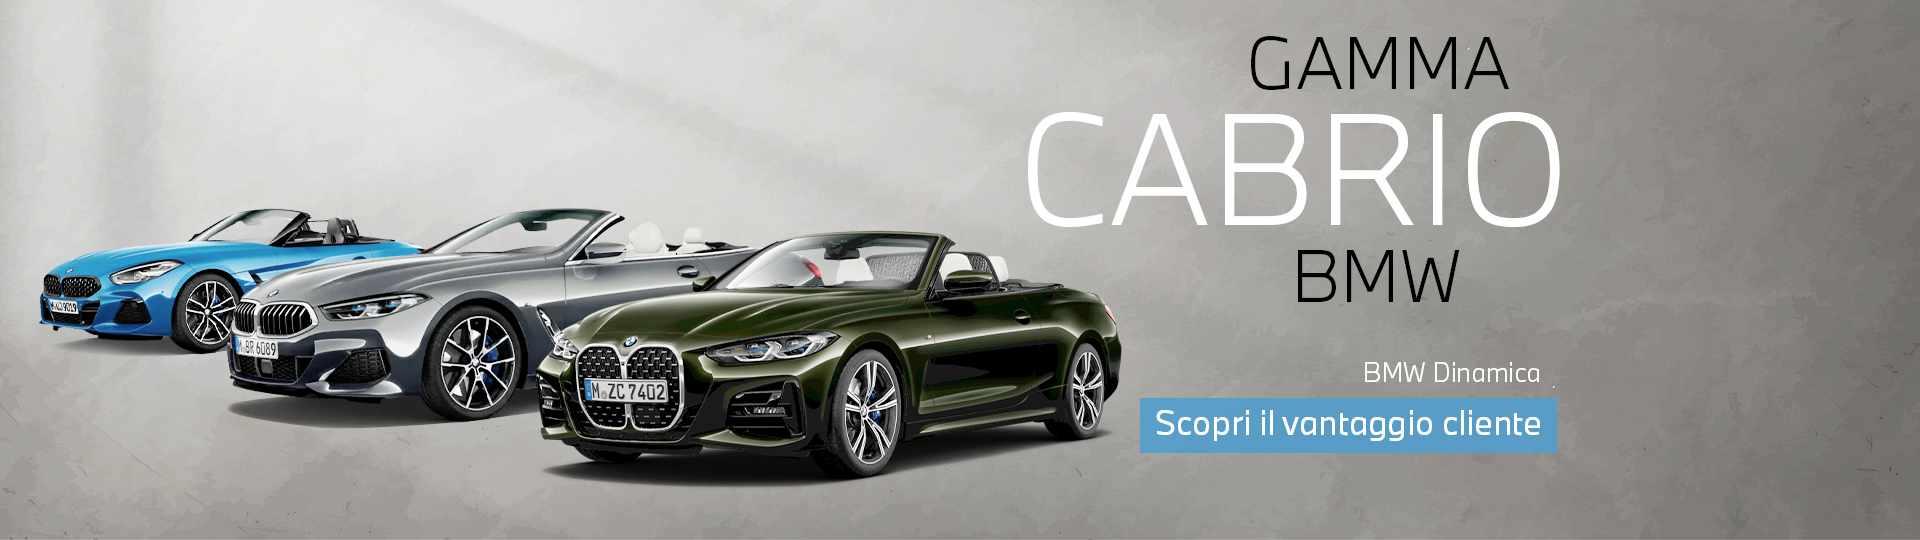 Gamma Cabrio copertina landing.jpg